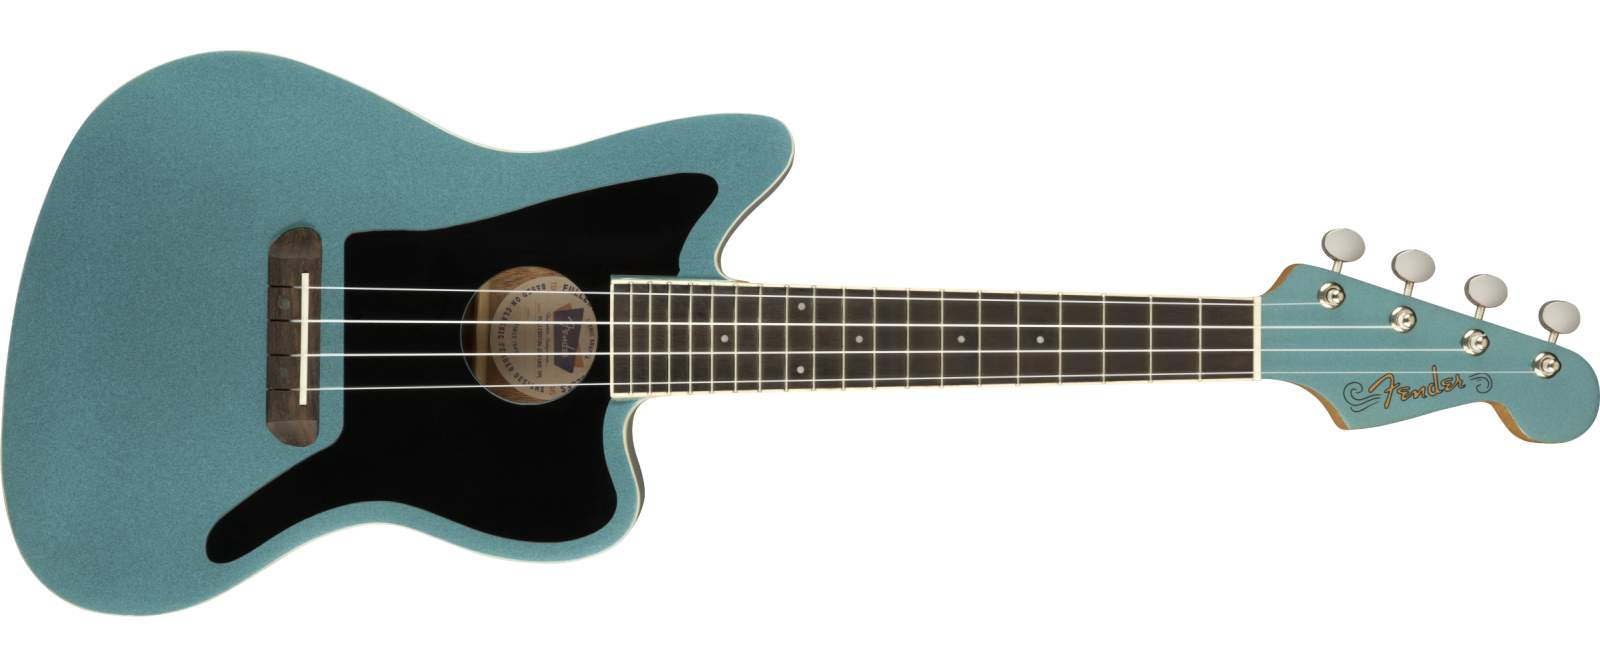 Fender Fullerton Jazzmaster Ukulele TDL